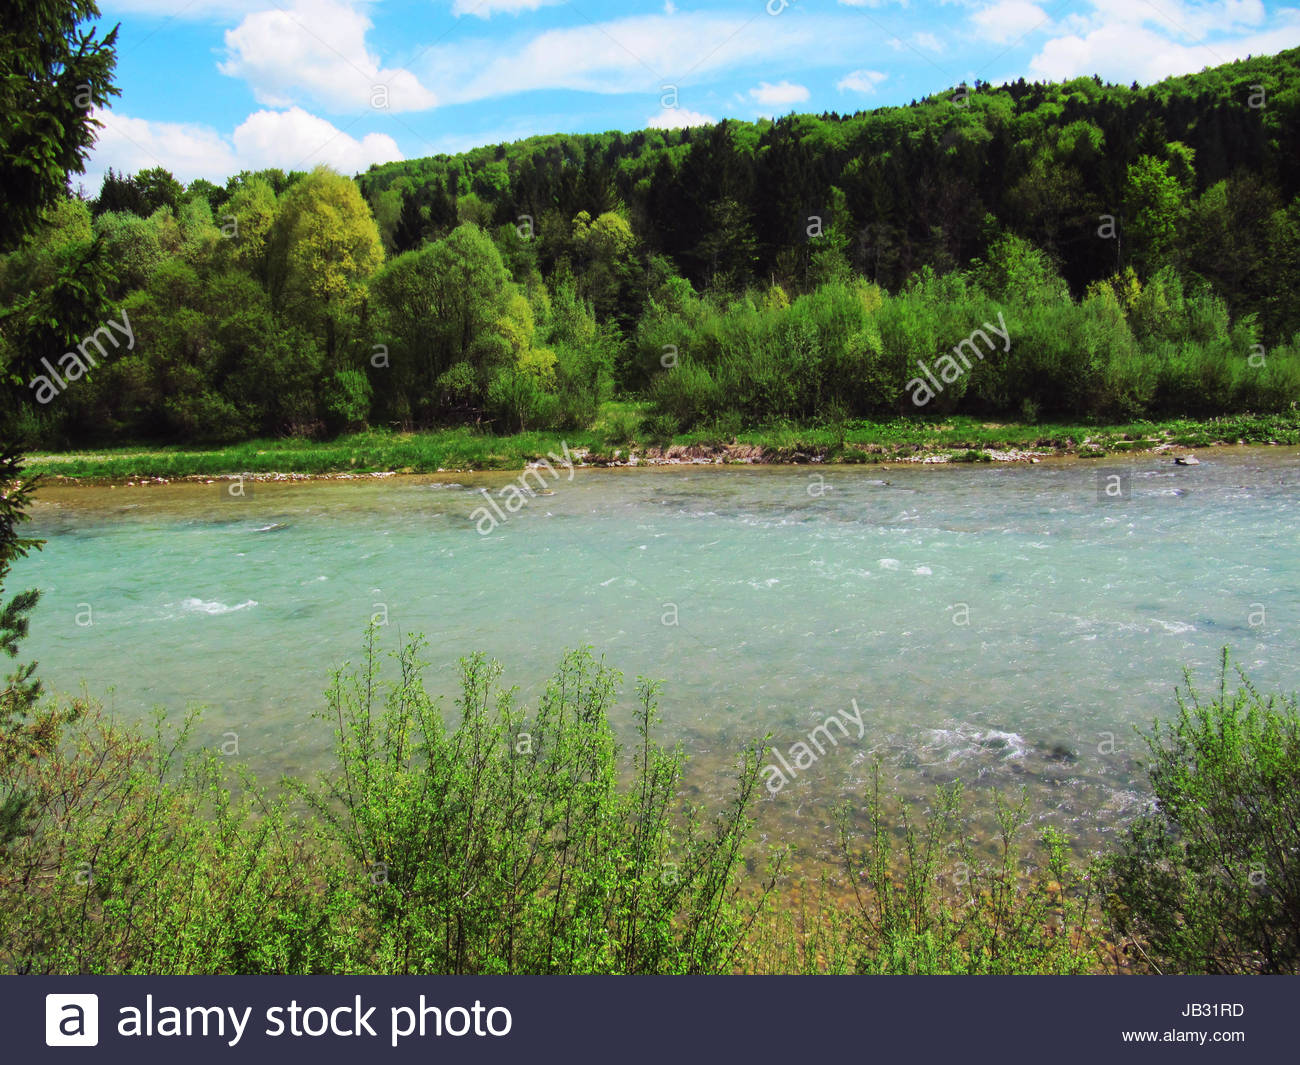 Isar in der Pupplinger Au, bei Geretsried Isar river in the Pupplinger Au near Geretsried - Stock Image